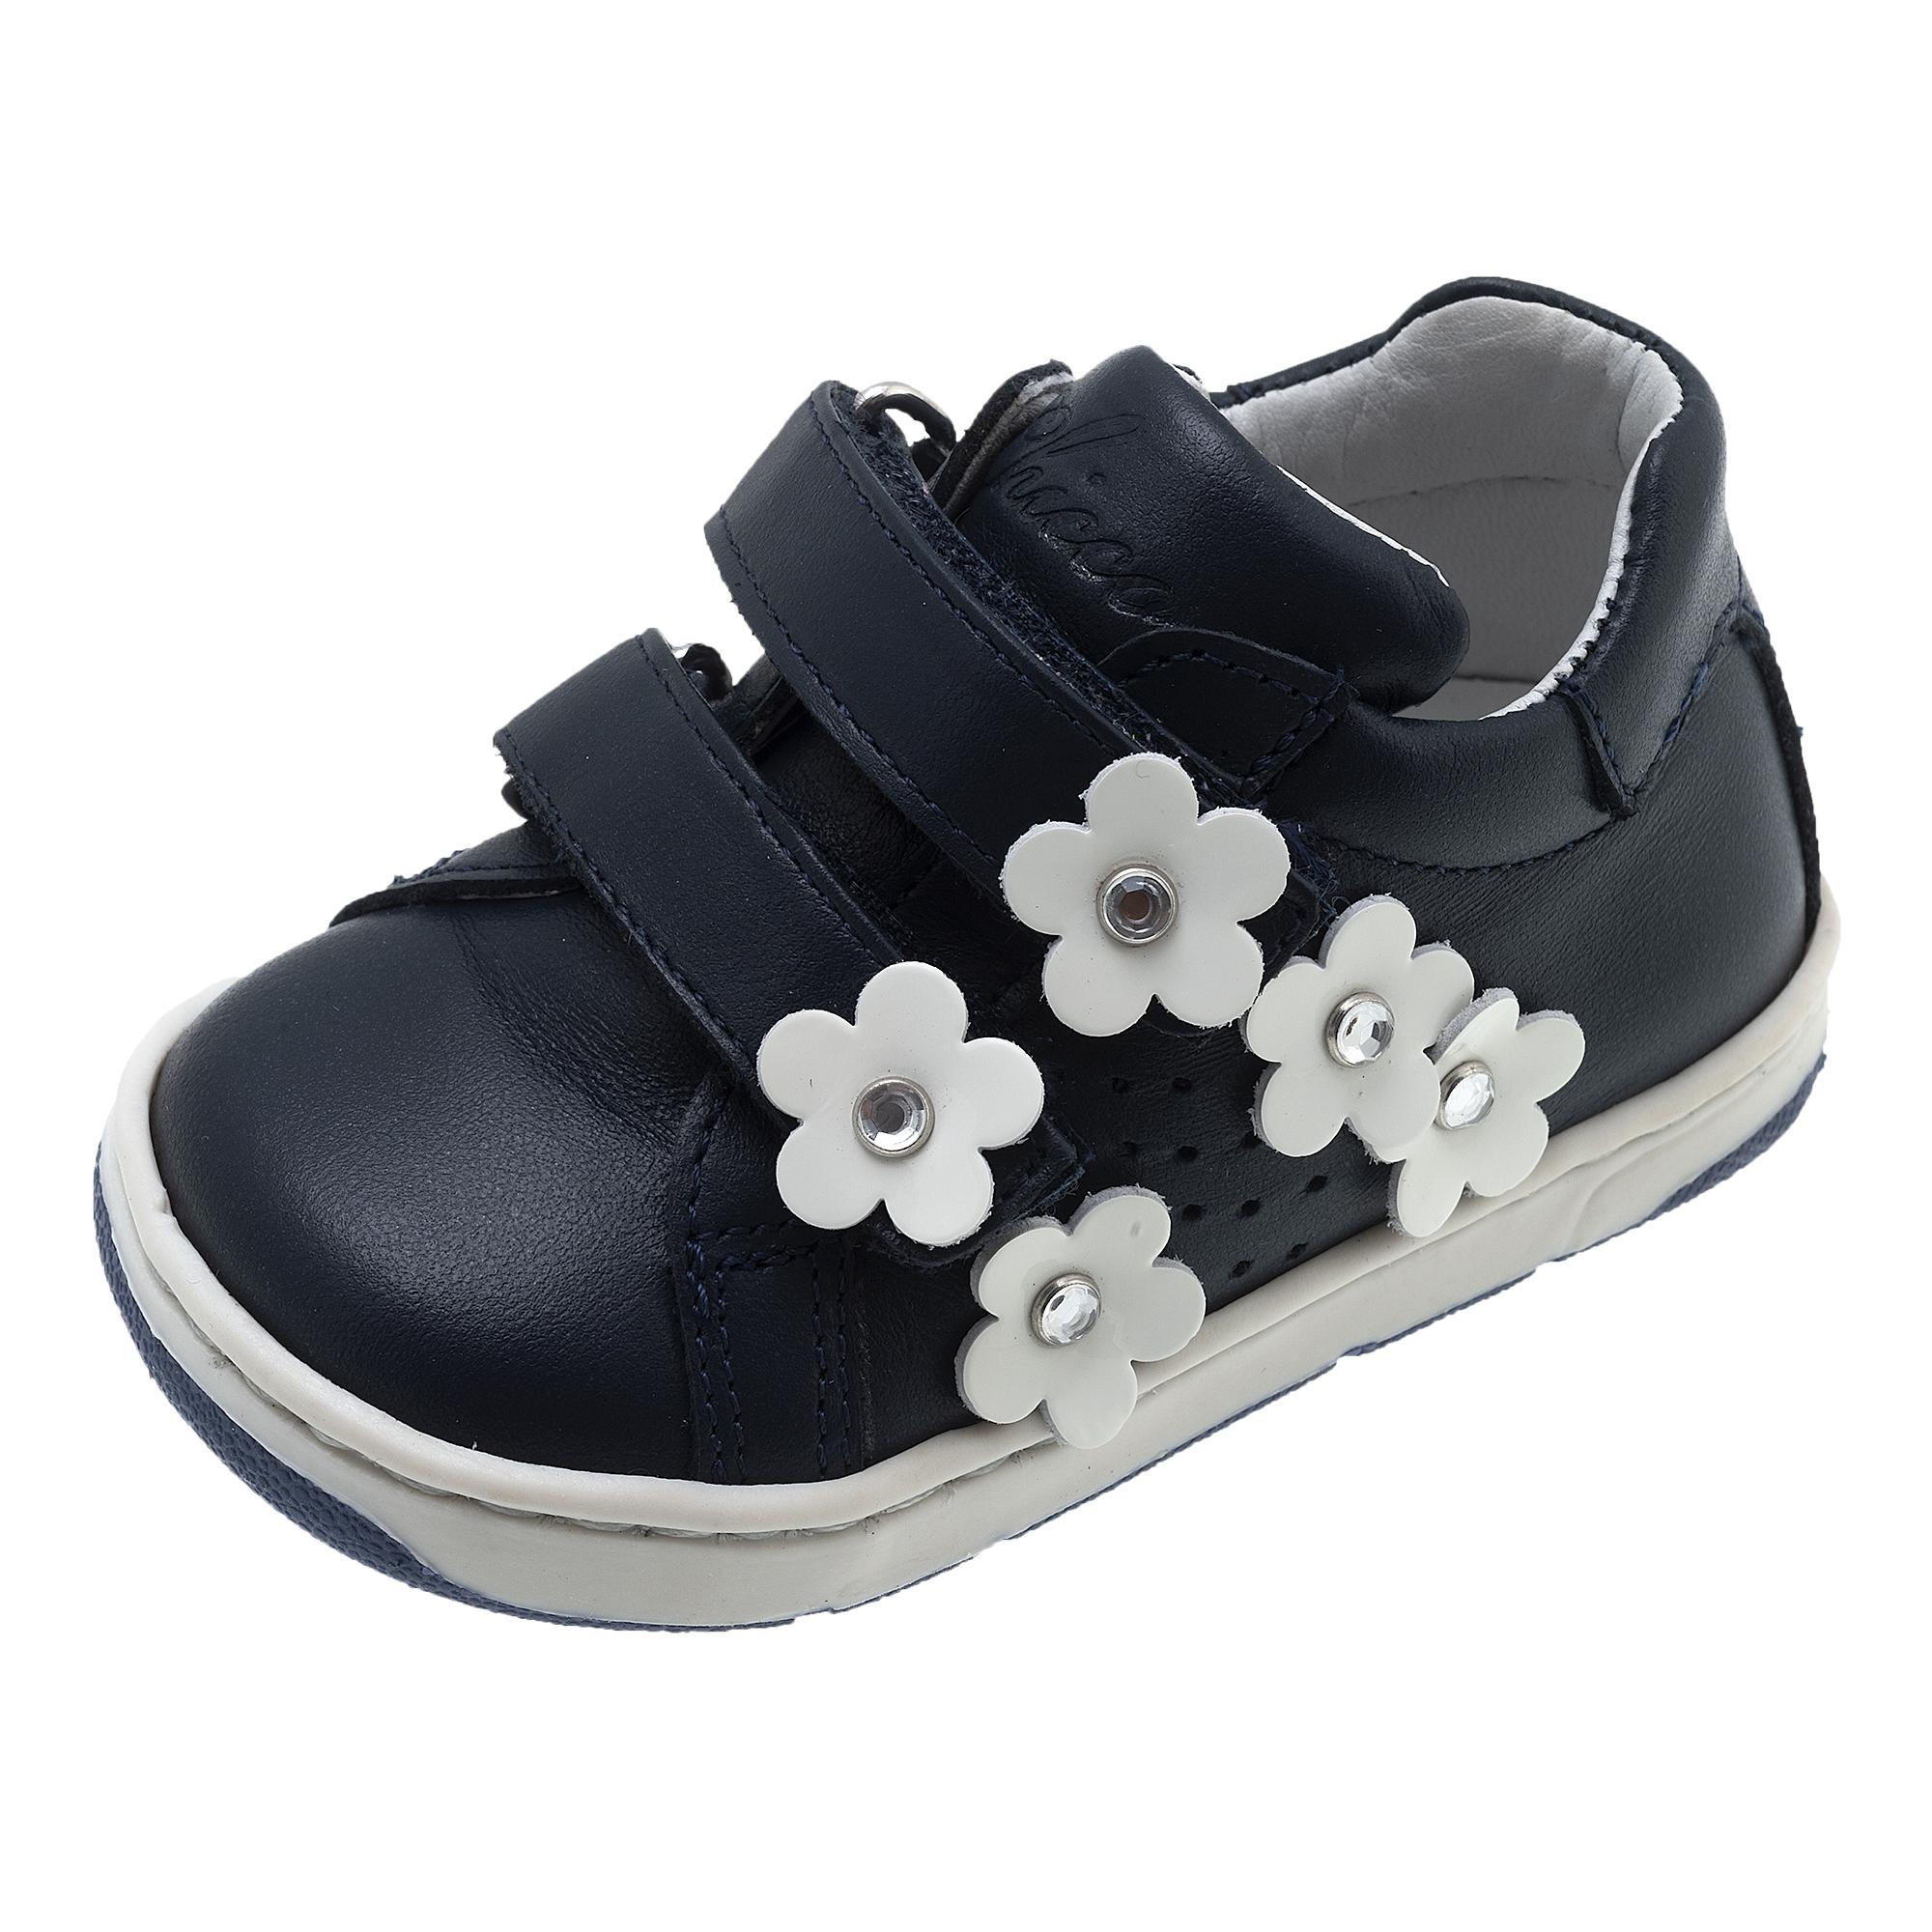 Pantofi Copii Chicco Granny, Bleumarin, 63501 imagine